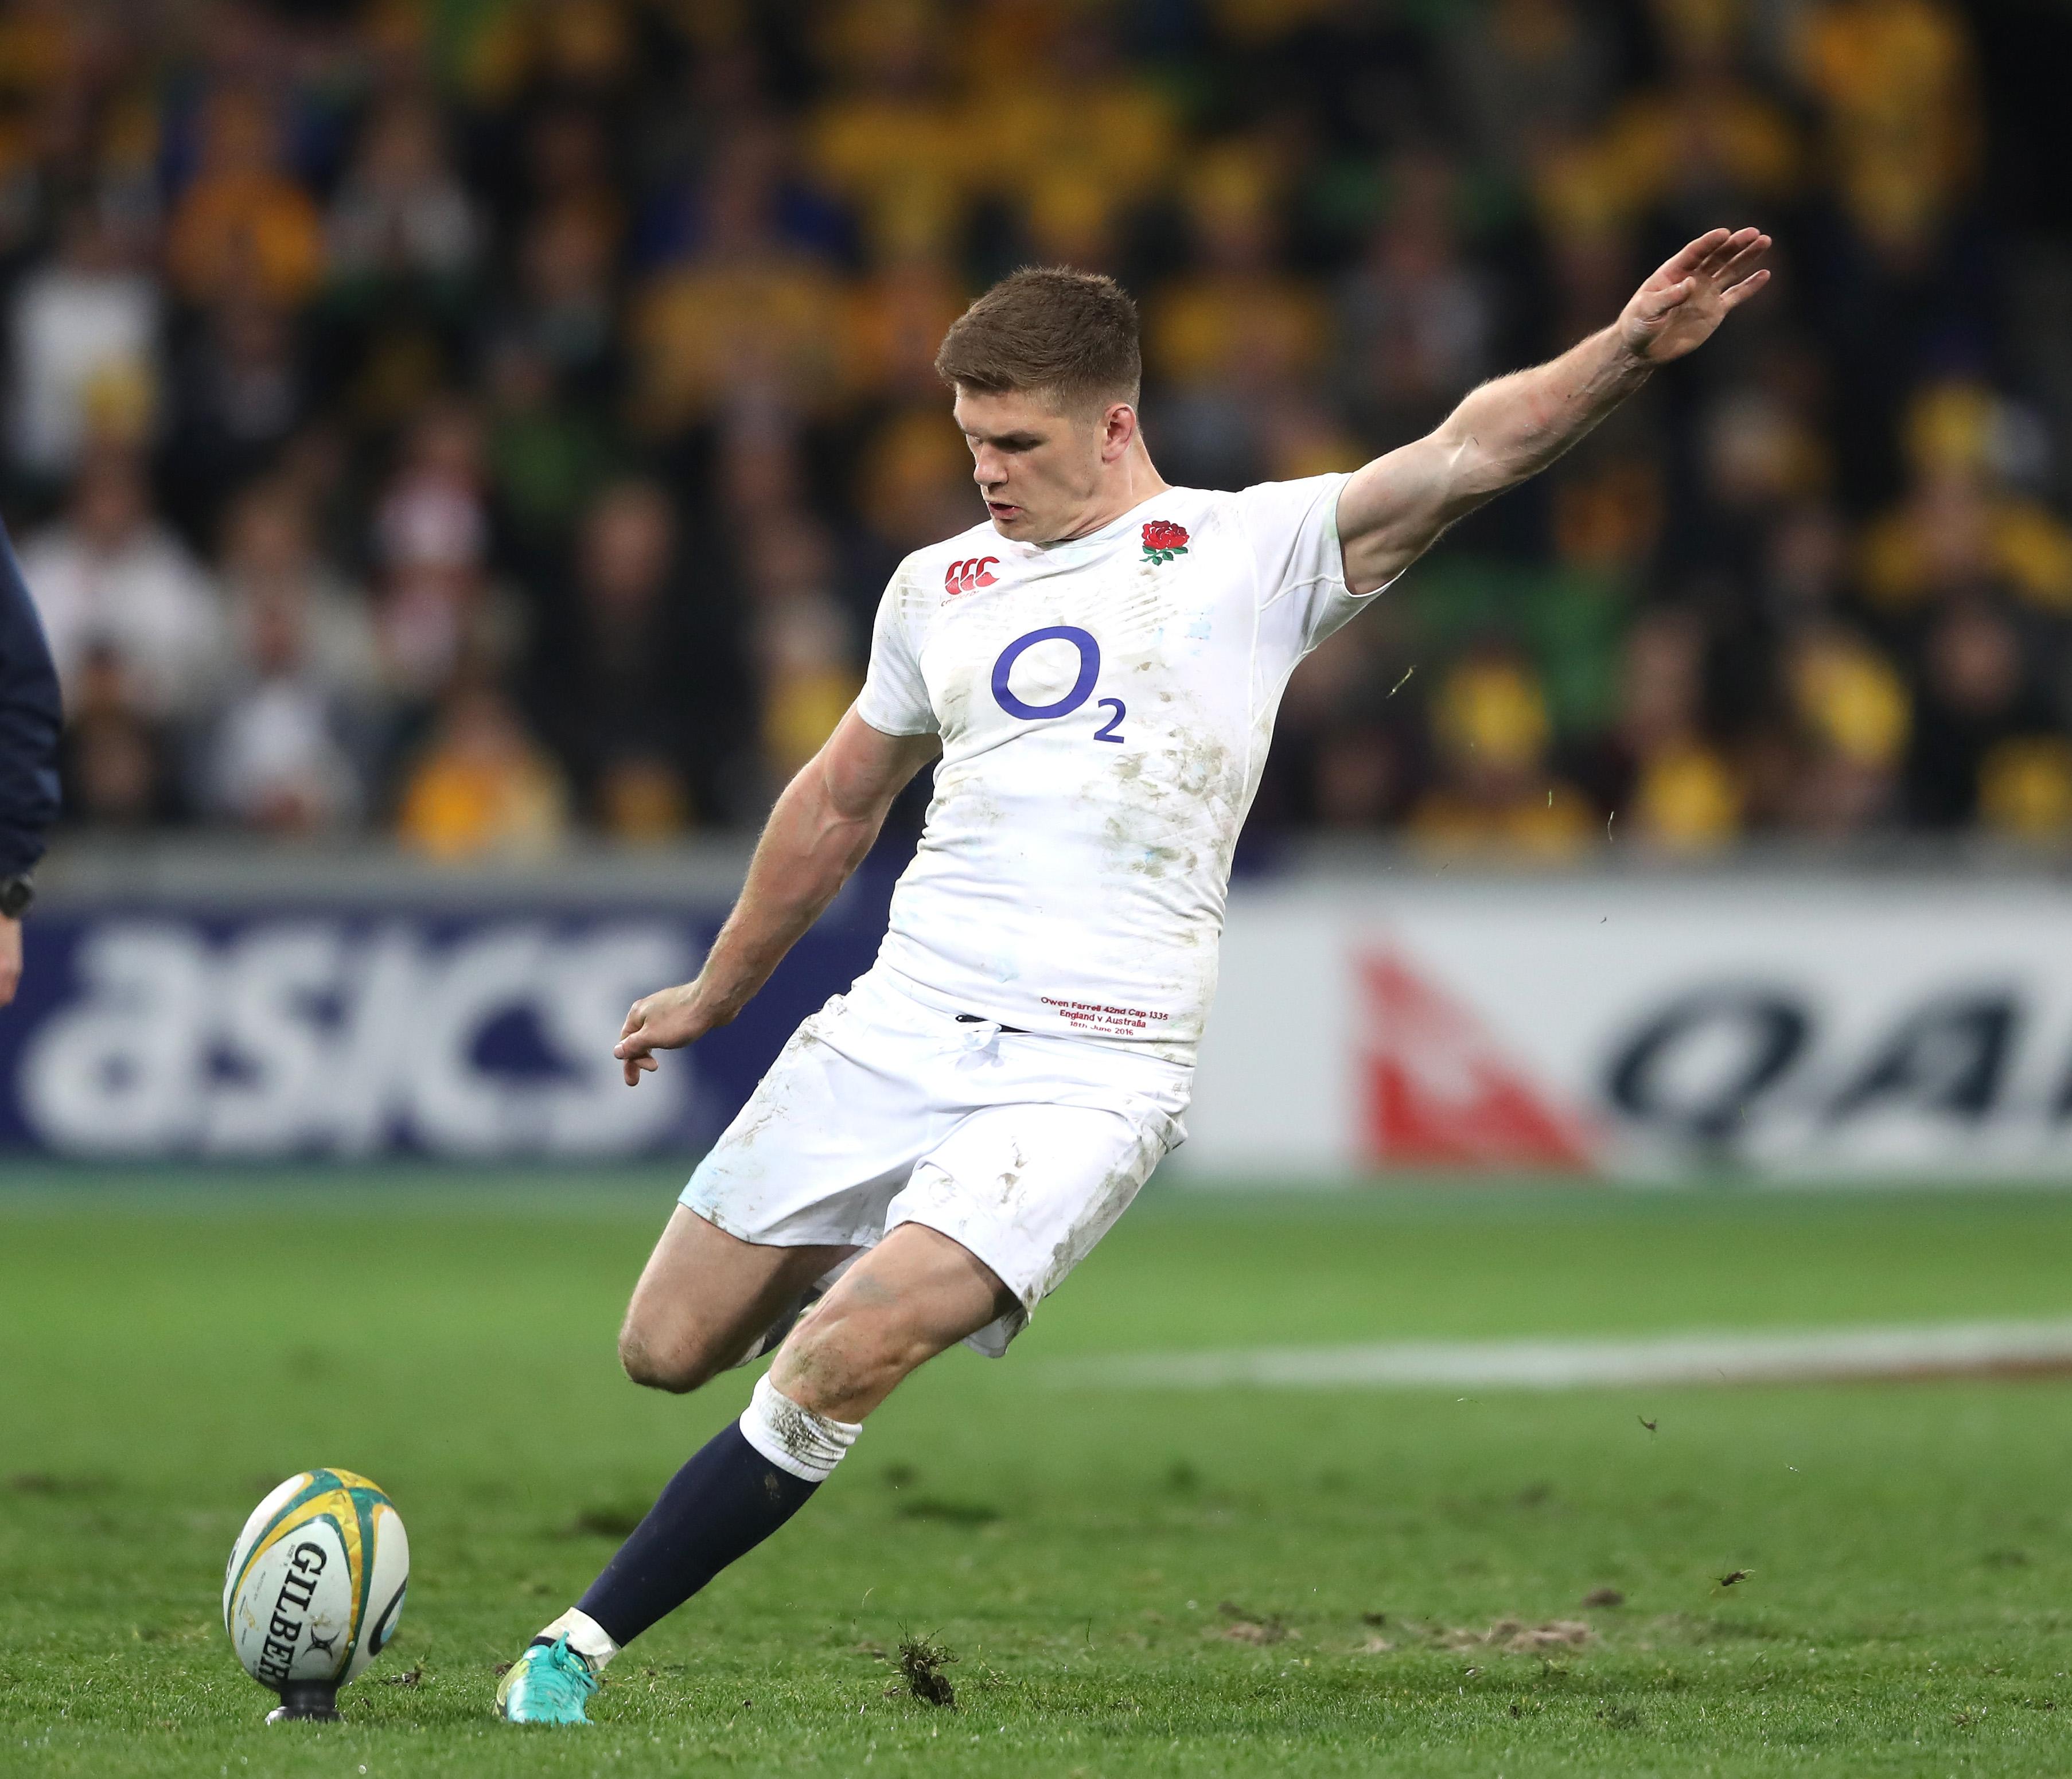 Australia 7-23 England: Owen Farrell helps secure historic series win